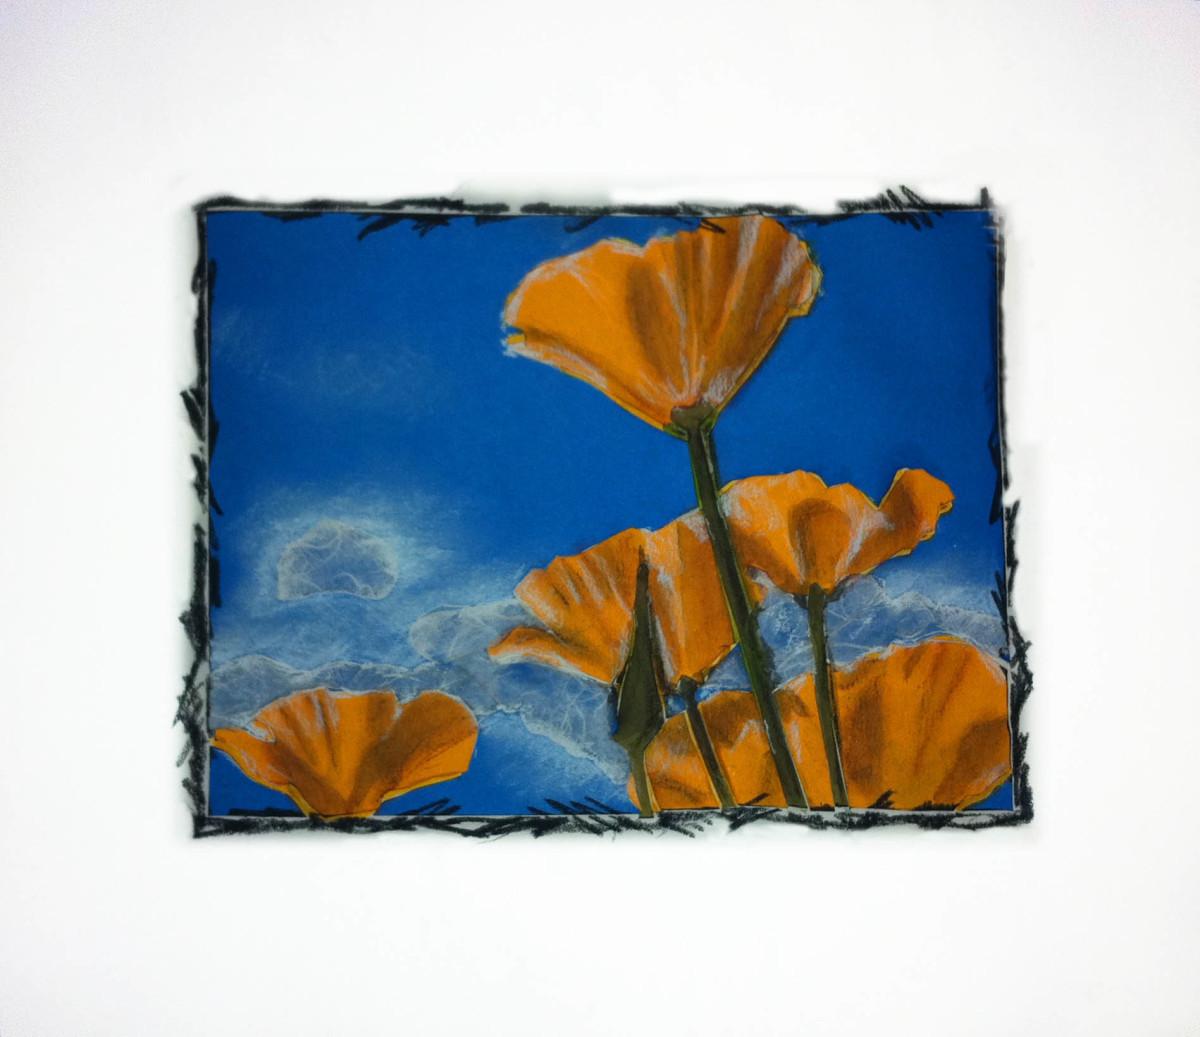 California Poppies by Kathy Ferguson